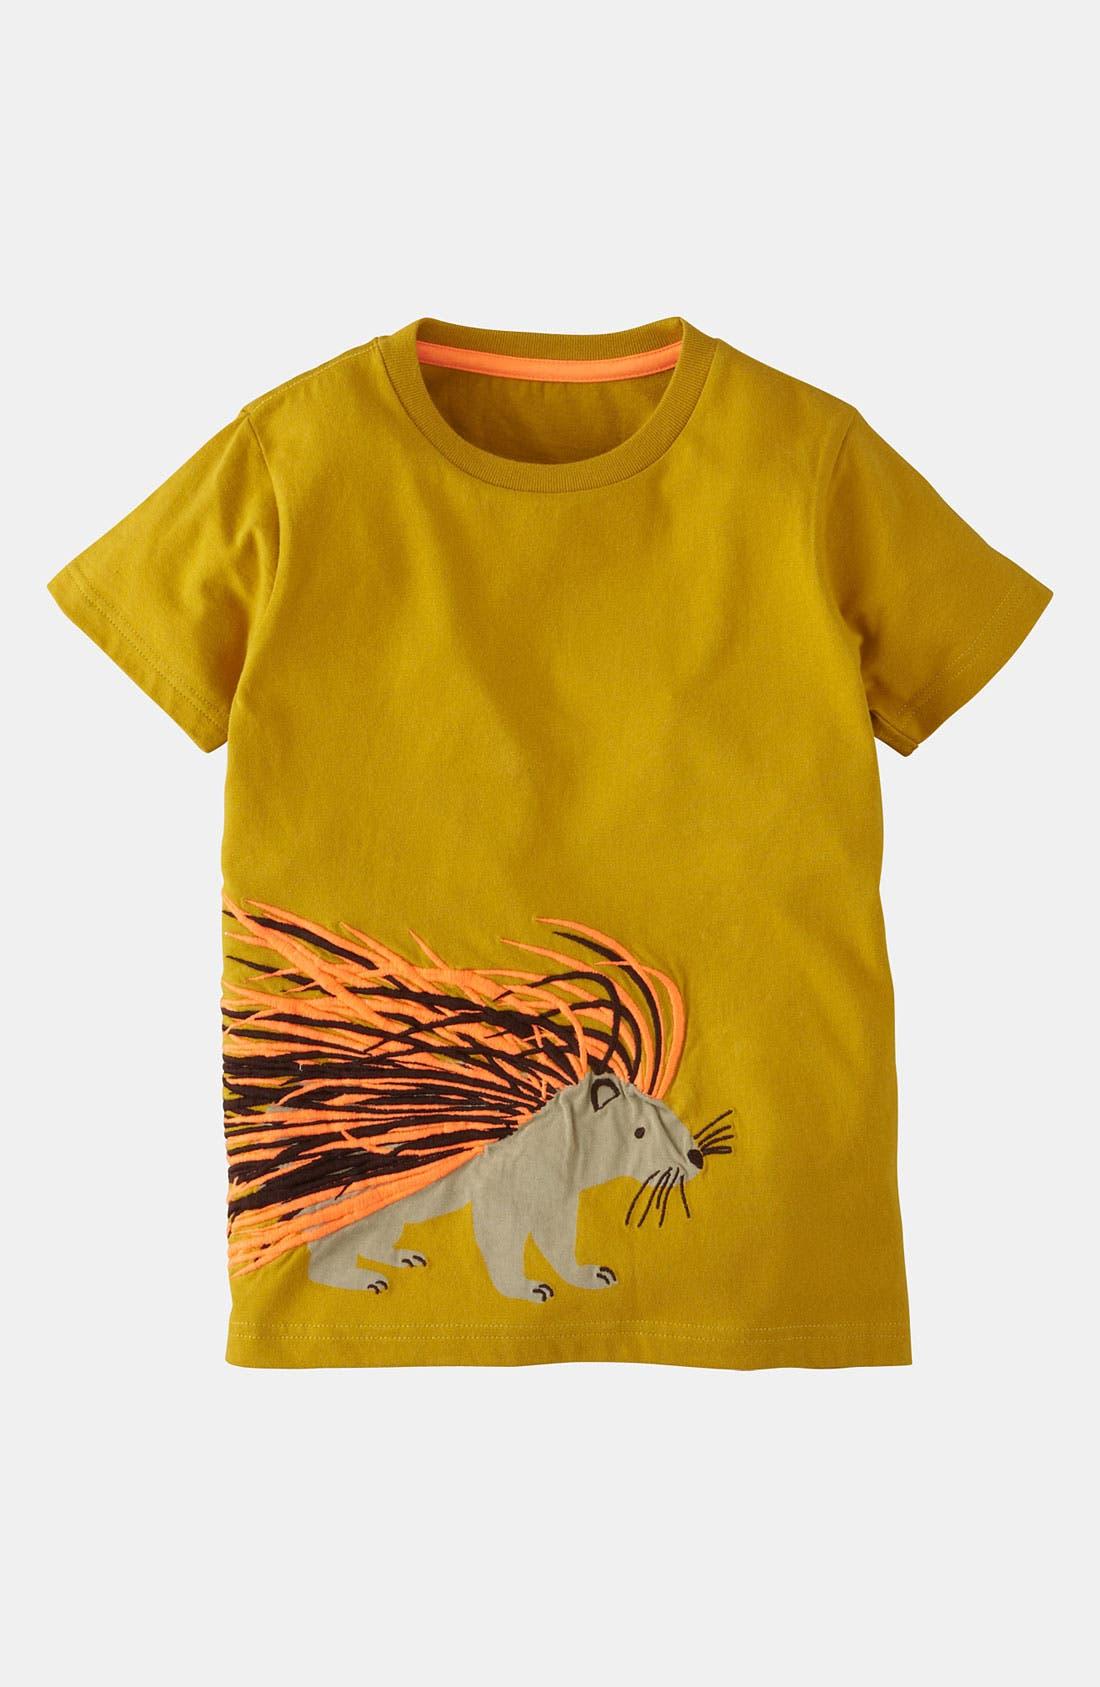 Alternate Image 1 Selected - Mini Boden 'Print & Stitch' T-Shirt (Little Boys & Big Boys)